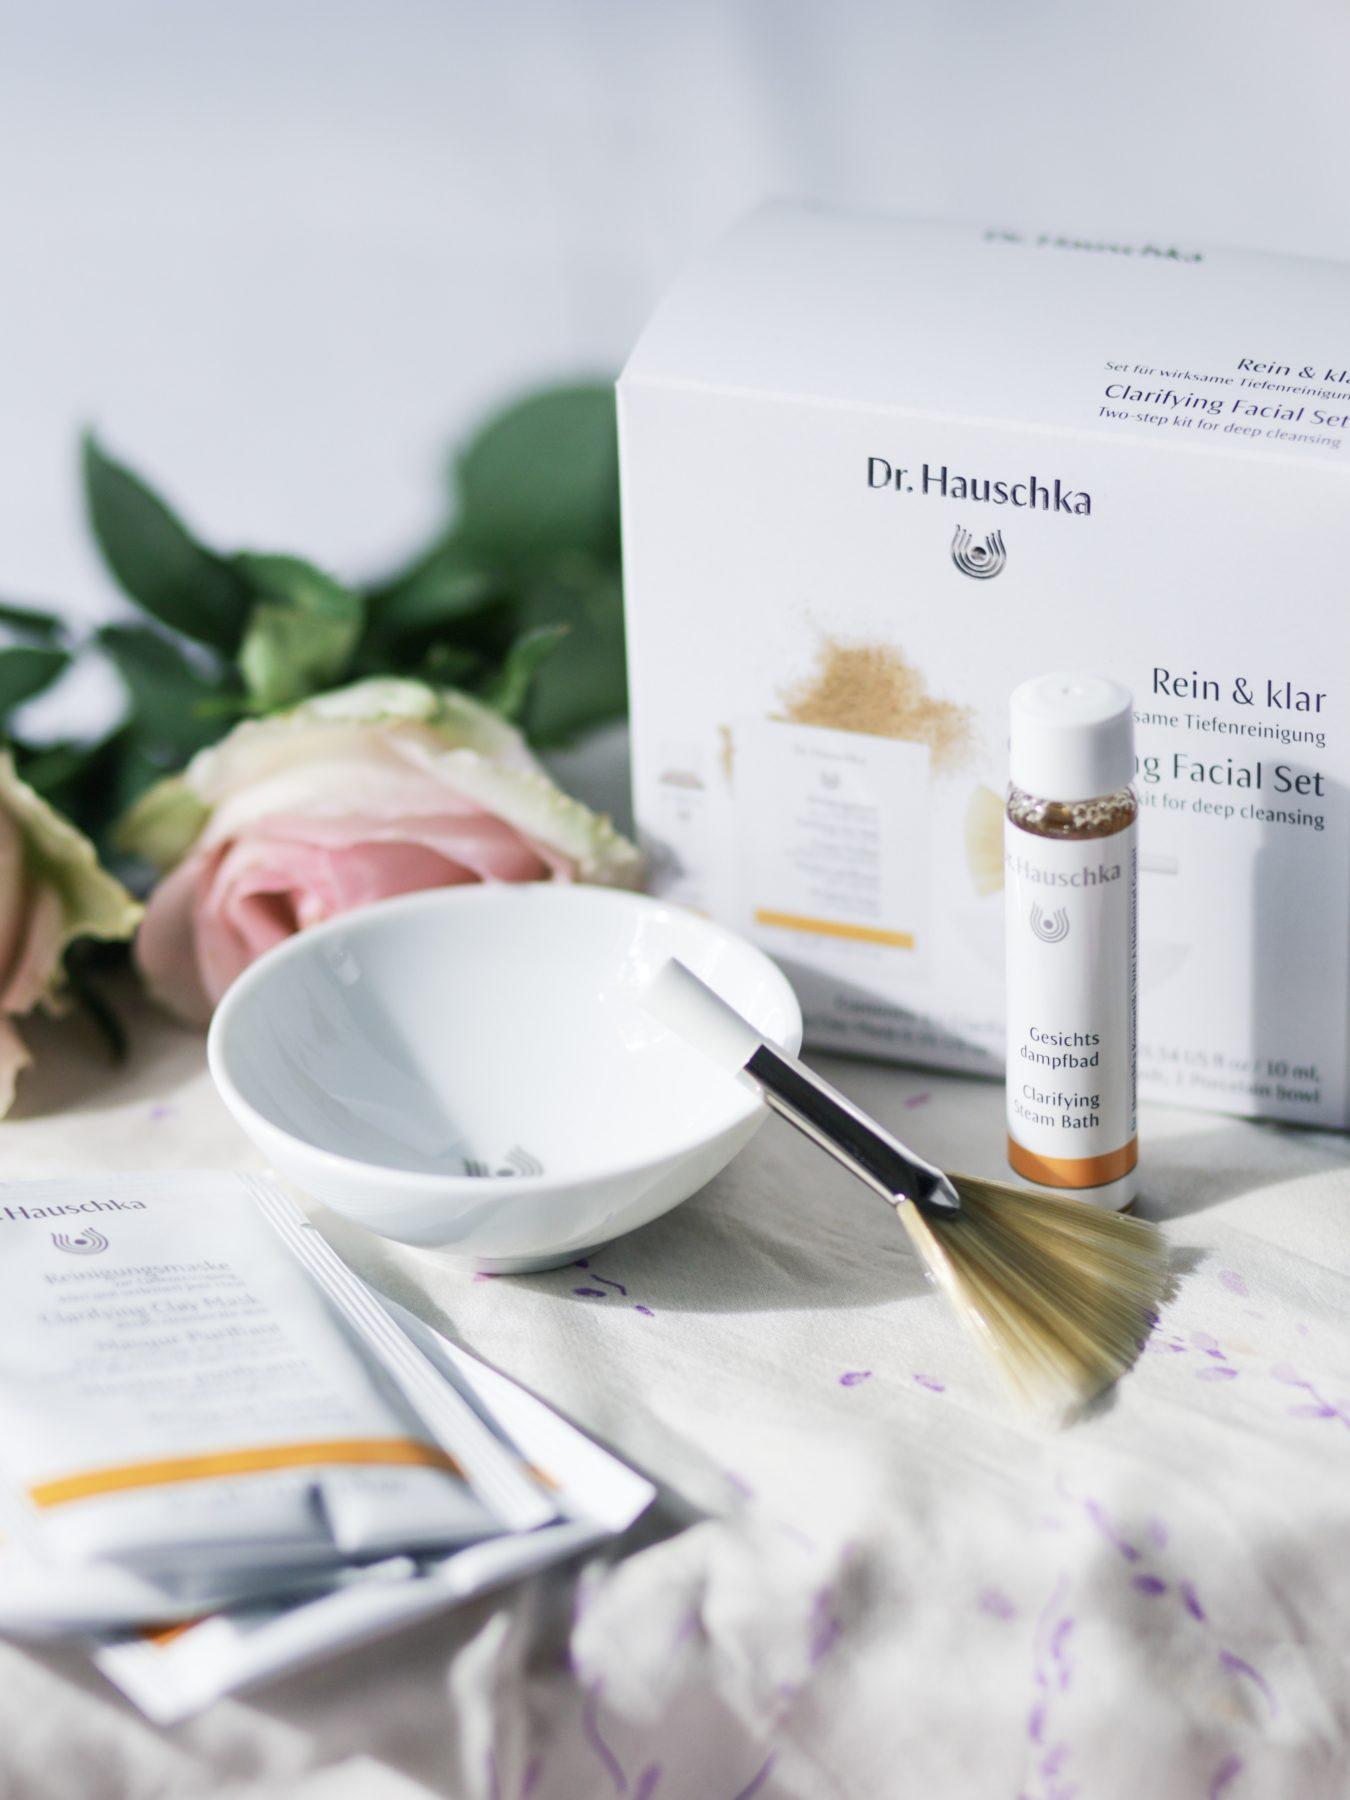 kit clair & net dr hauschka